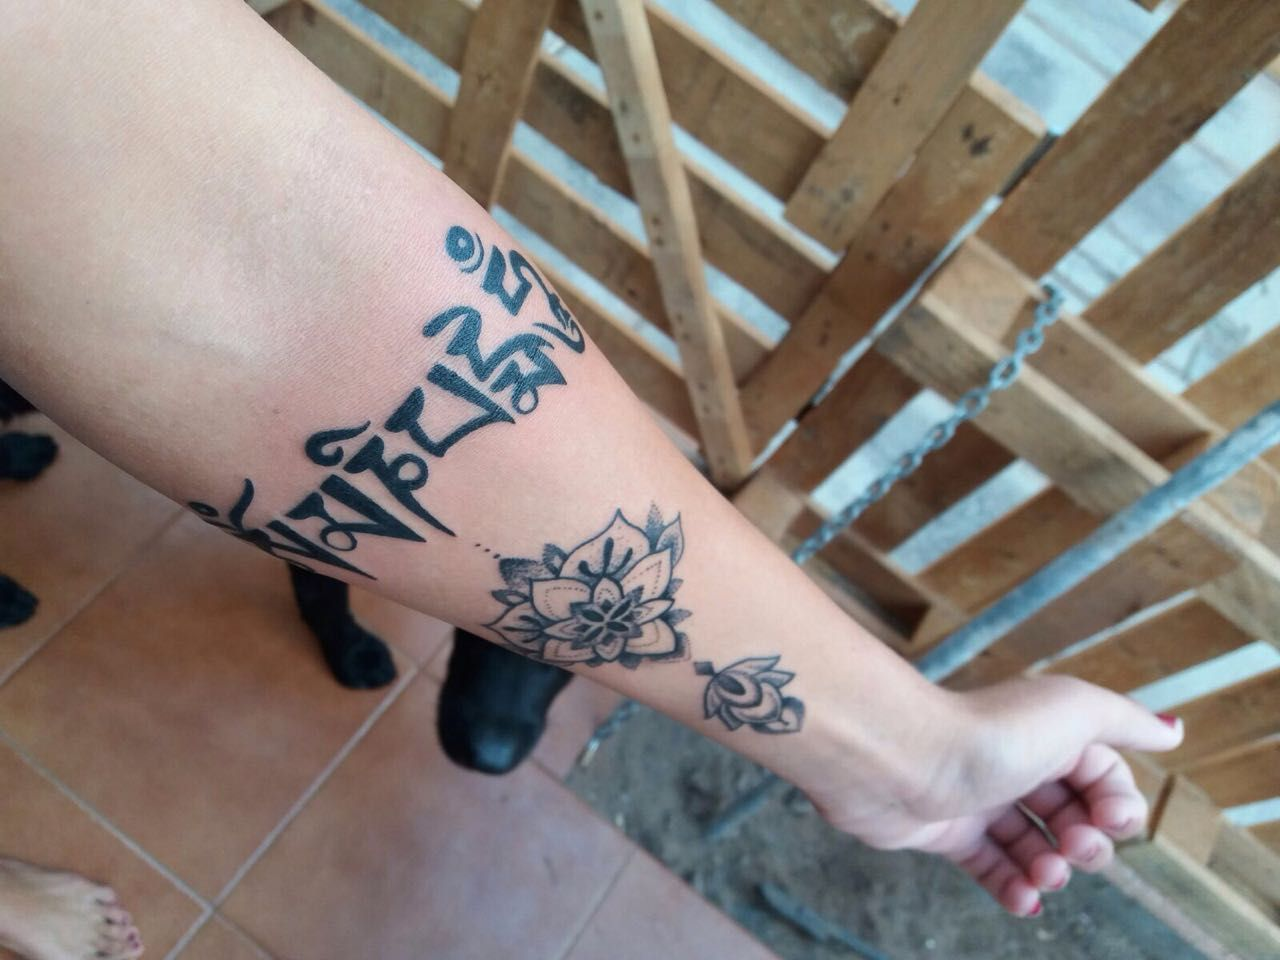 Bracelete Jonhy Tattoo desenho exclusivo